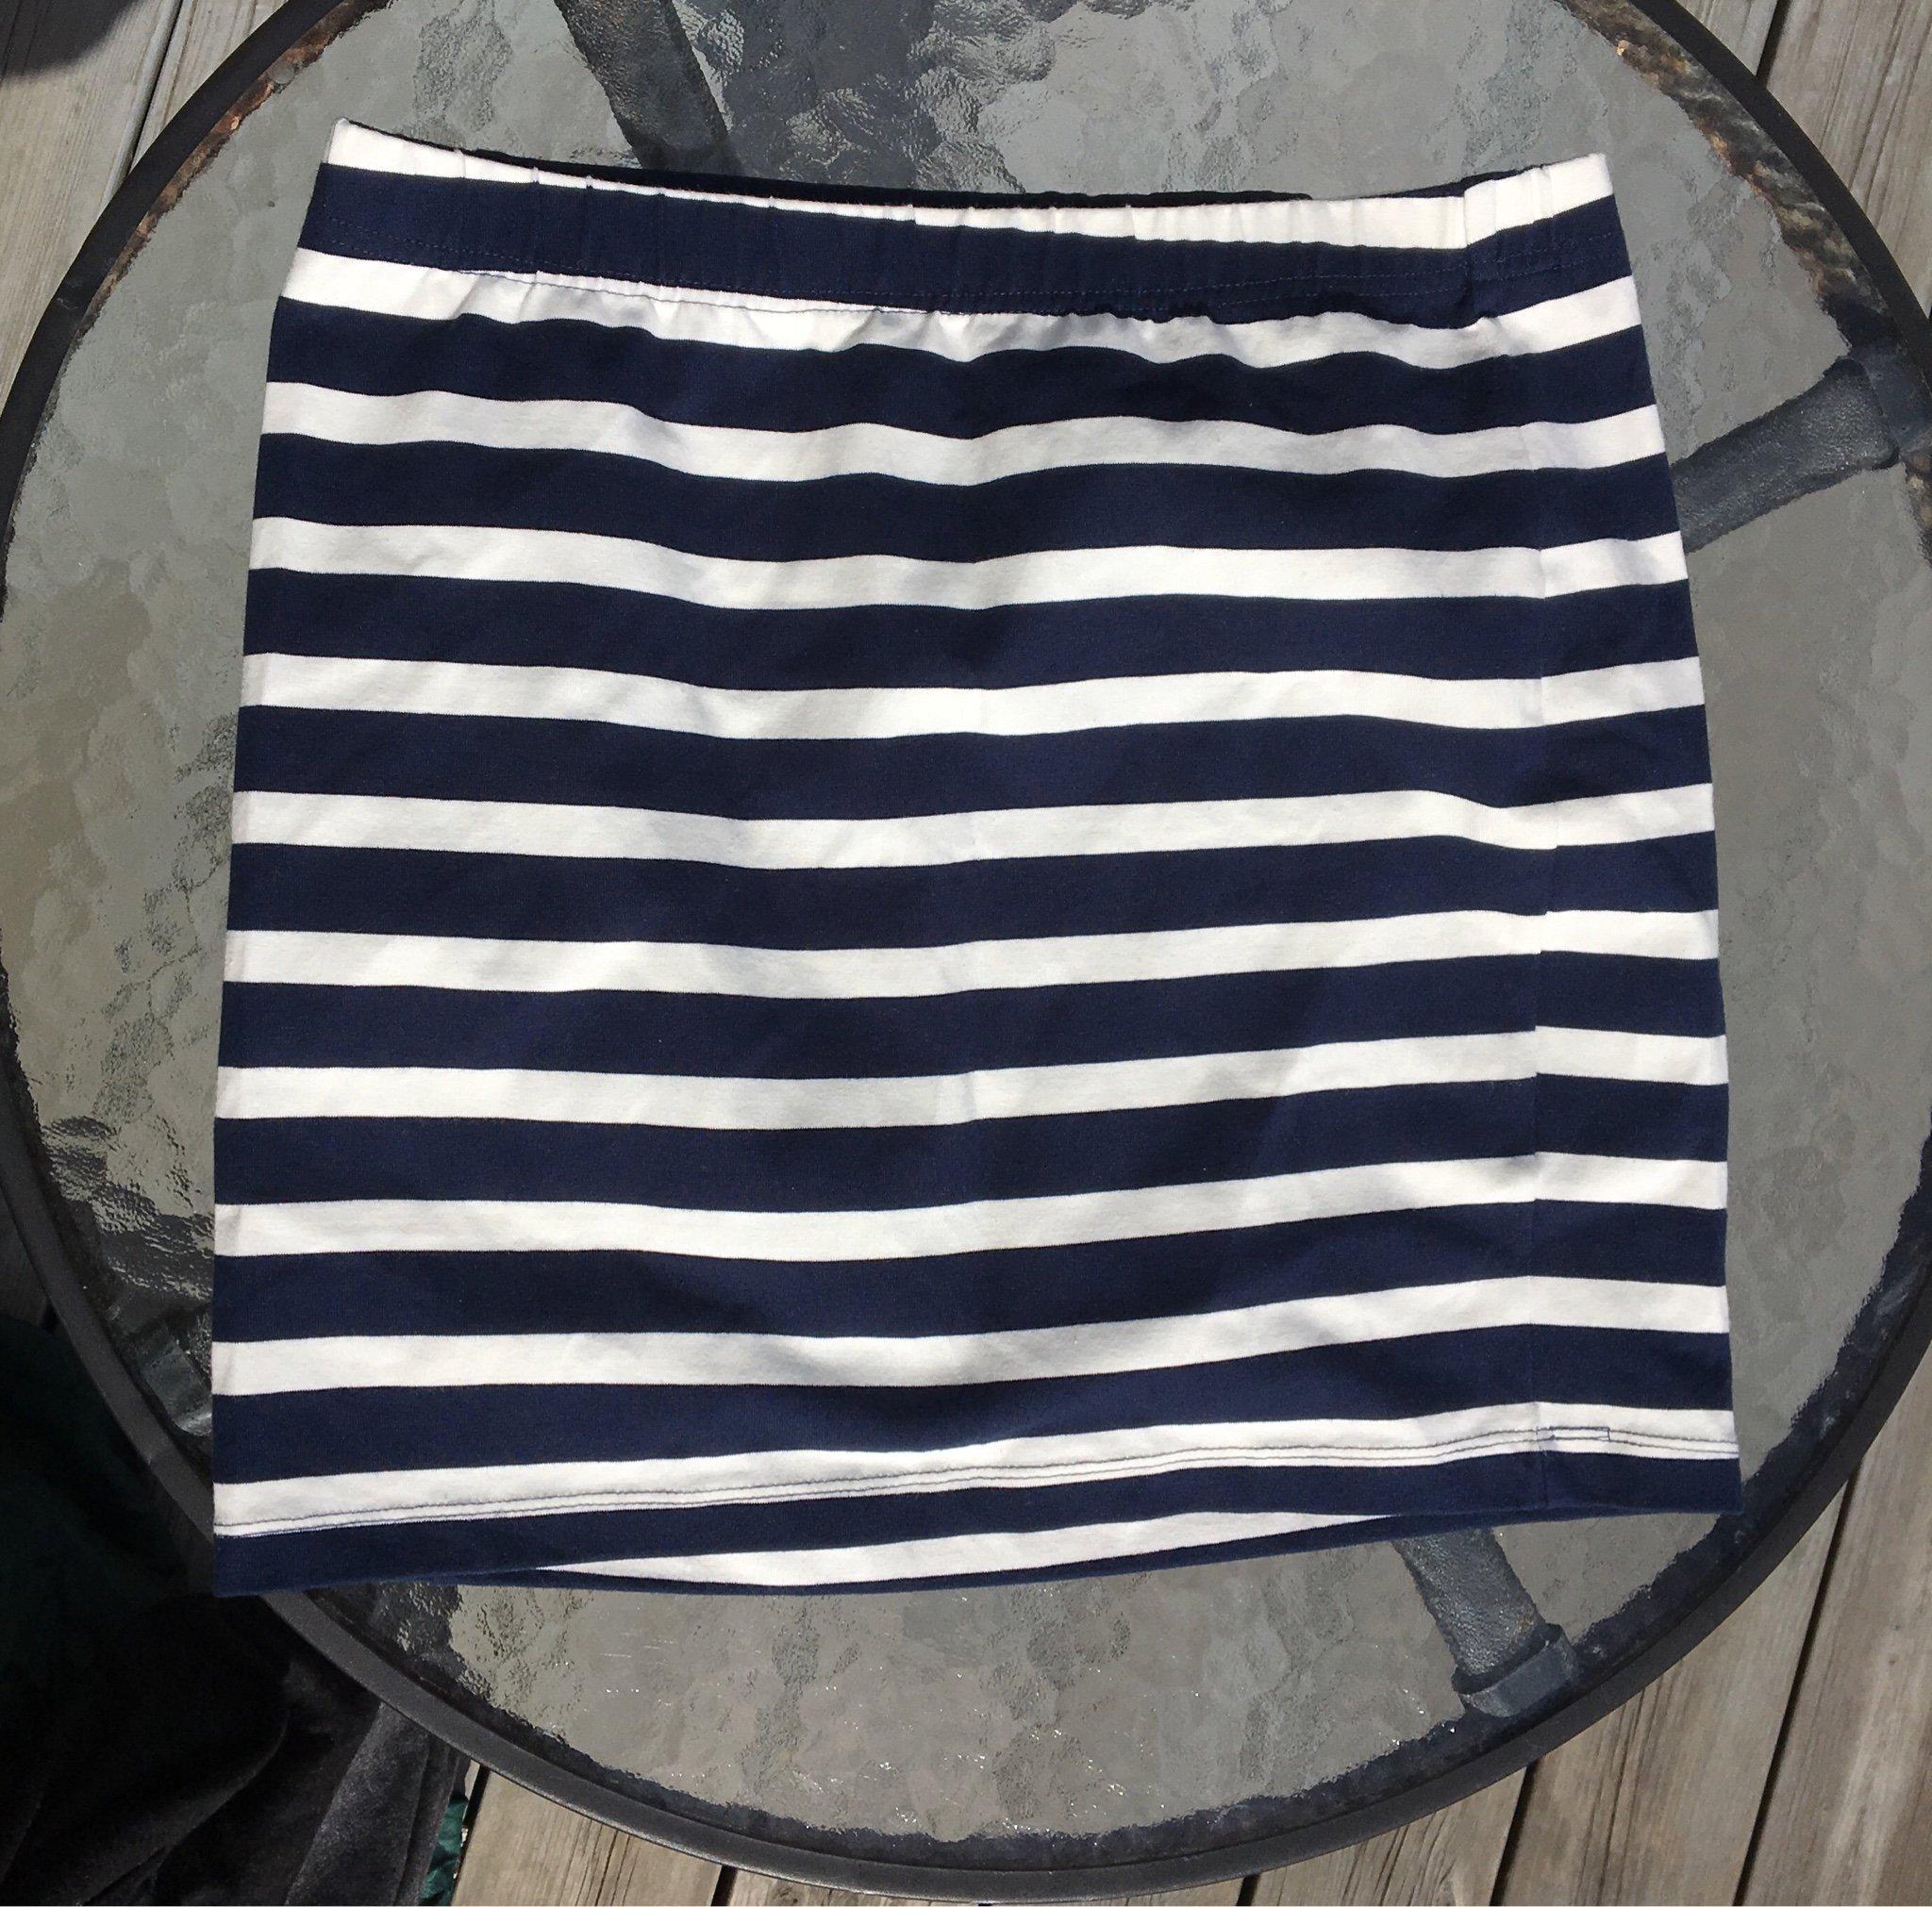 Blå Randig marinblå kjol 59:50 | Lindex